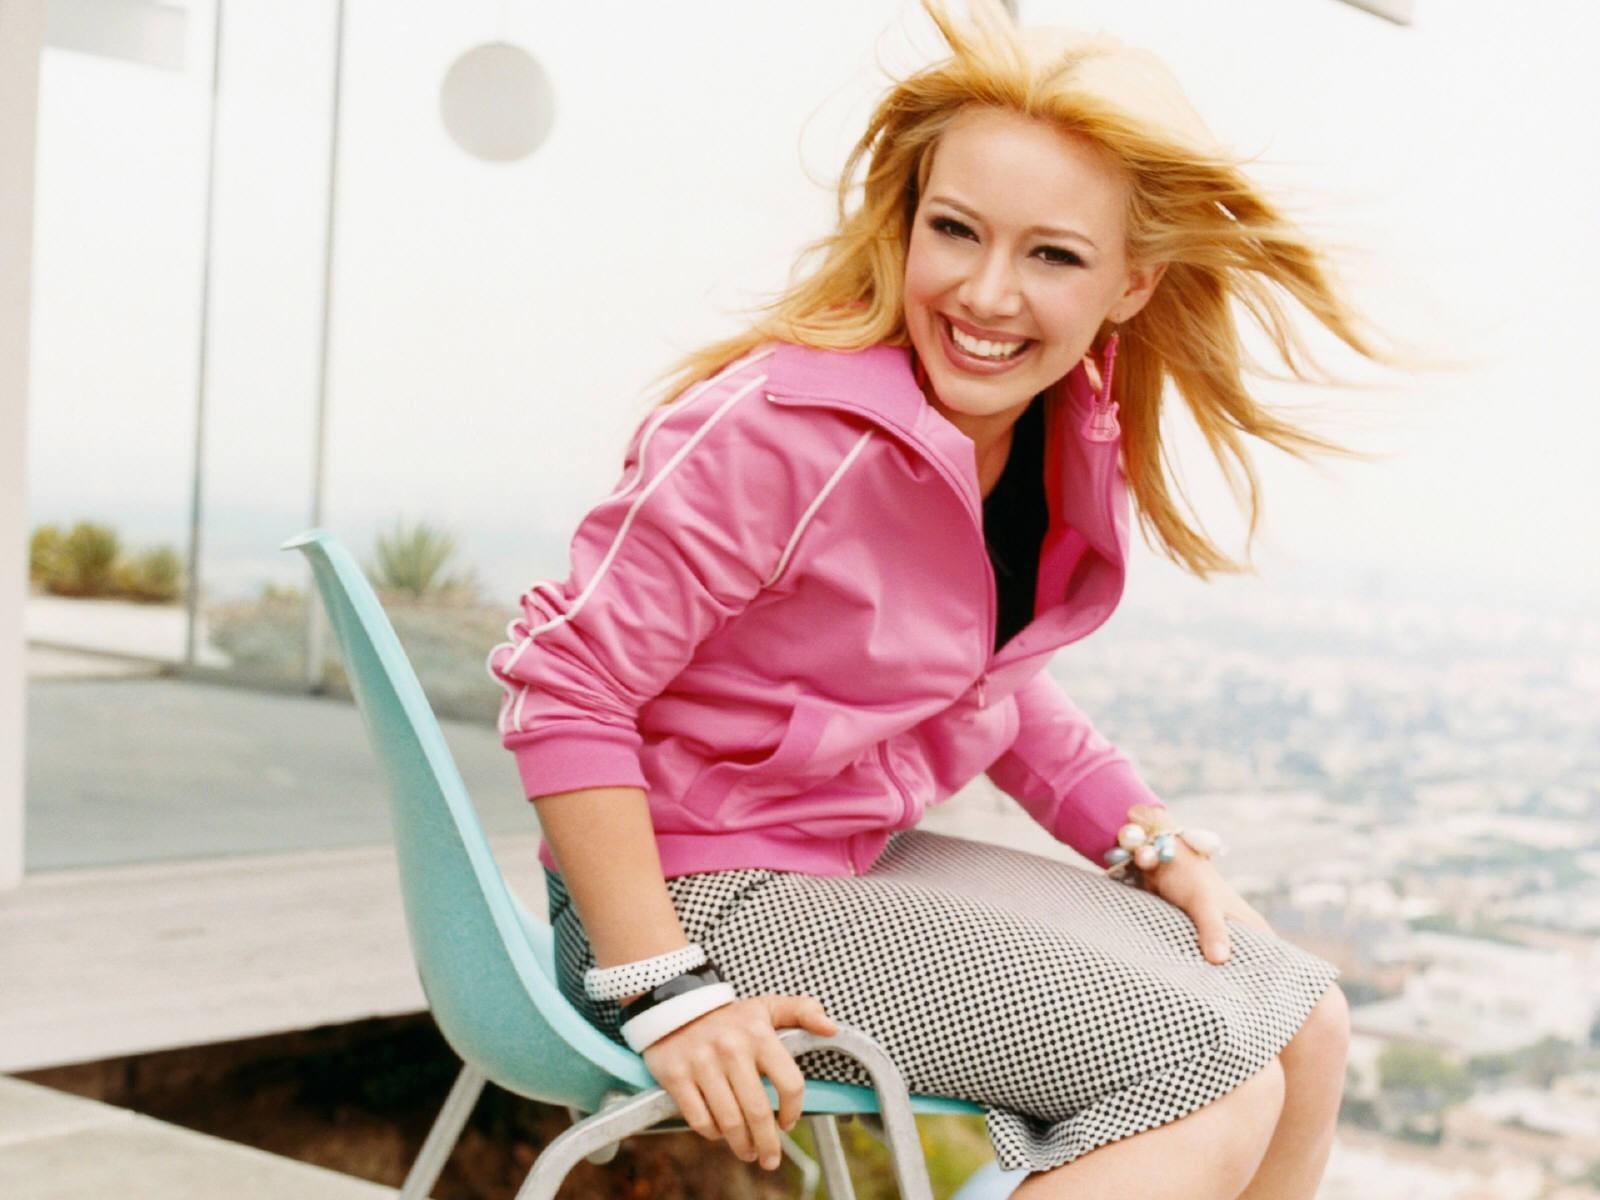 Wallpaper di Hilary Duff - 63